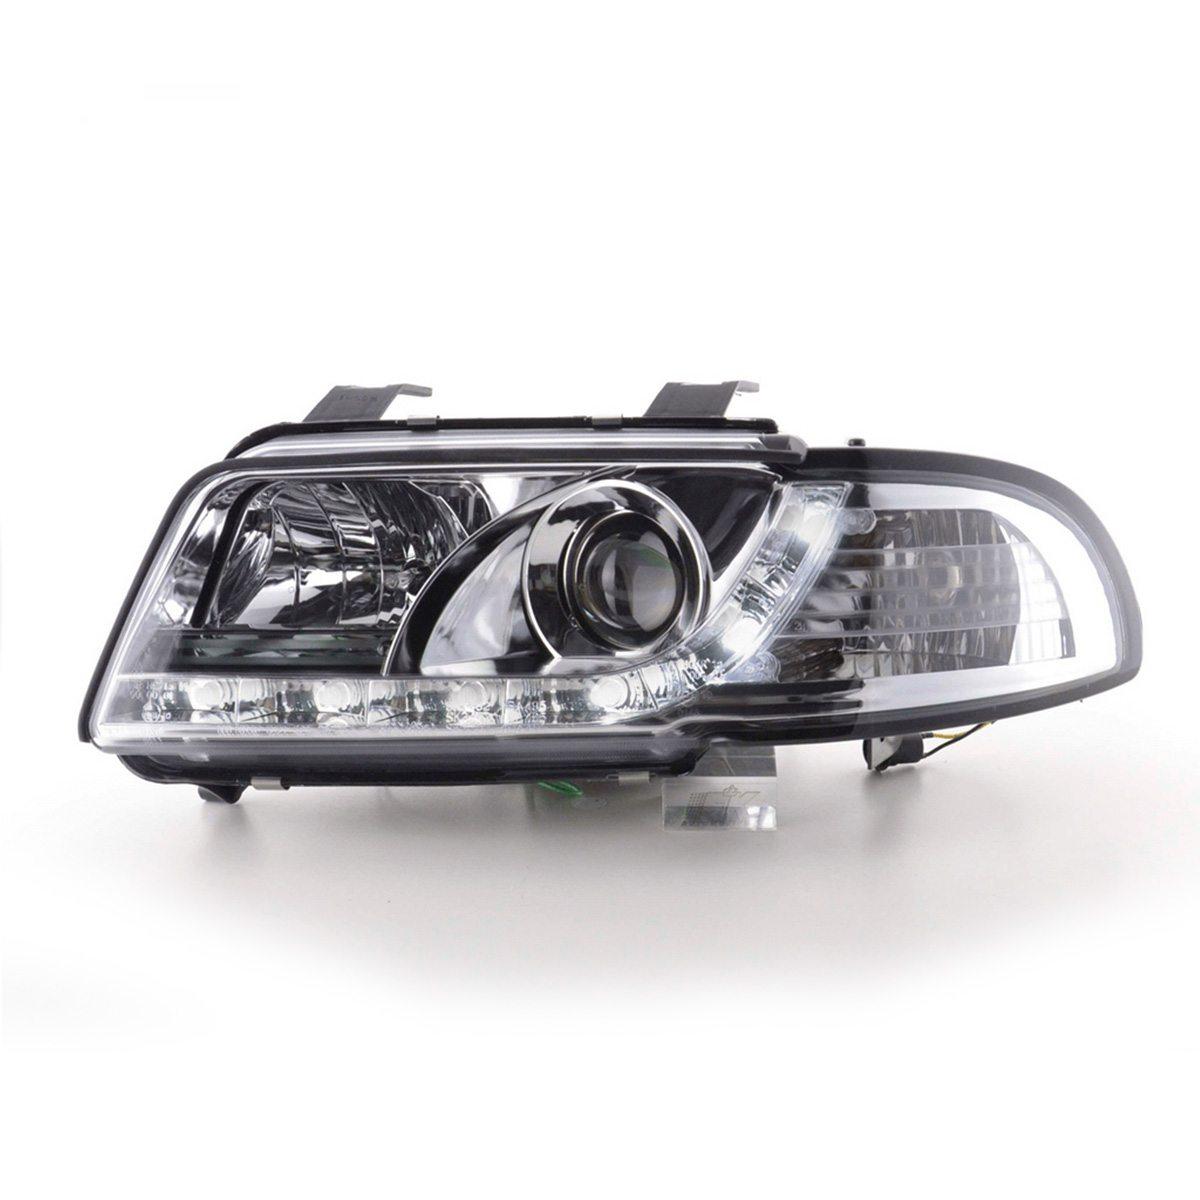 Audi-A4-B5-LimAvant-99-00-Faróis-Angel-Eyes-Dayline-Cromados-2